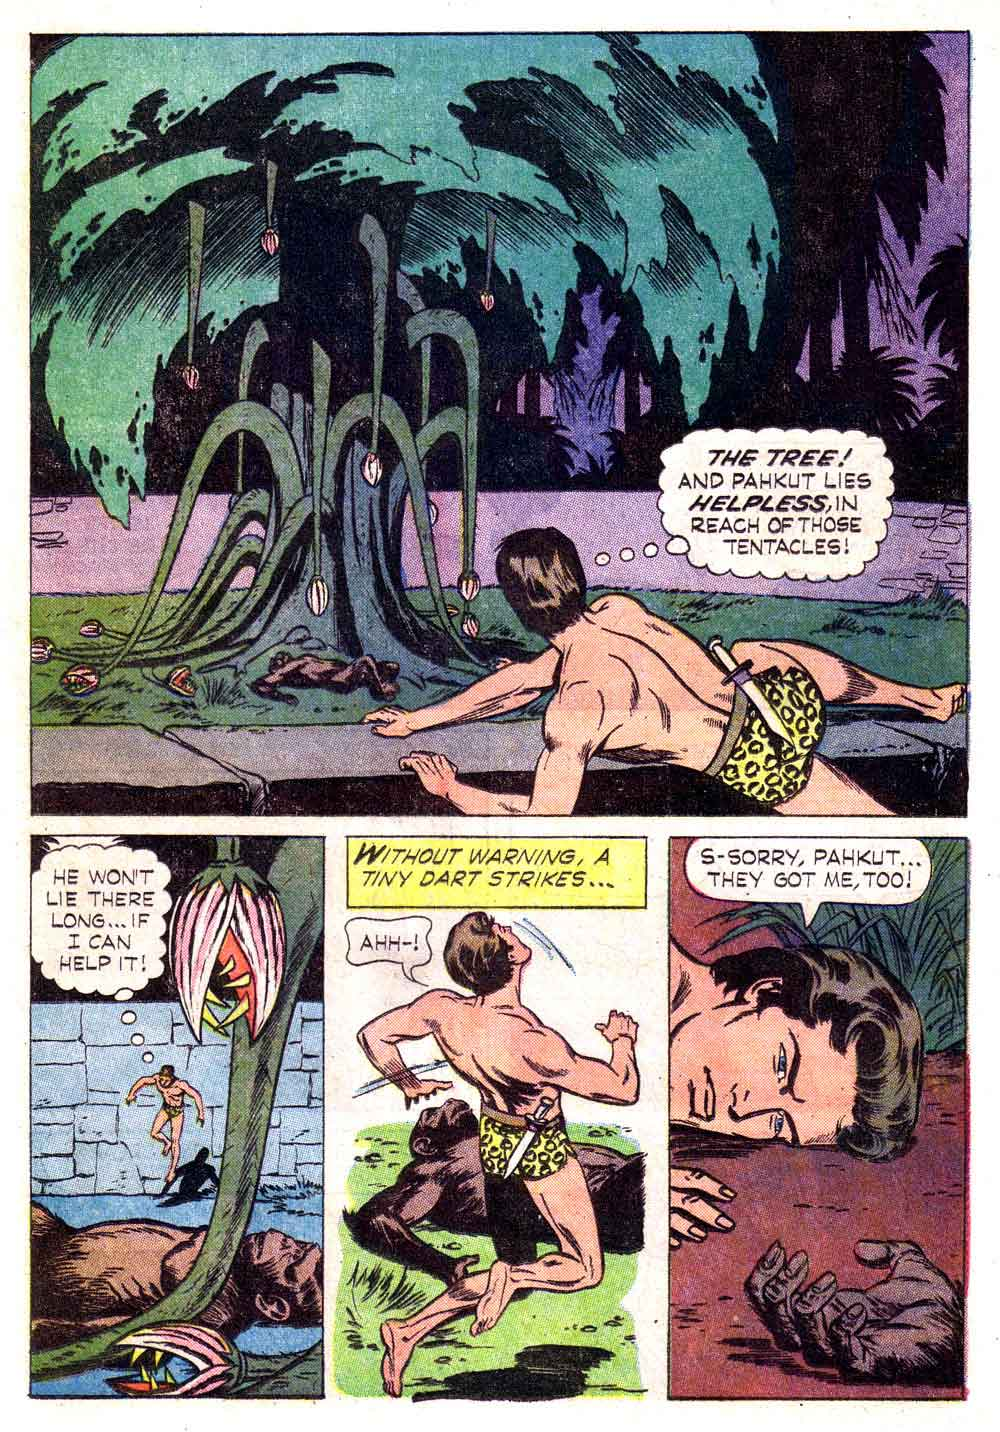 Korak Son of Tarzan v1 #5 gold key silver age 1960s comic book page art by Russ Manning